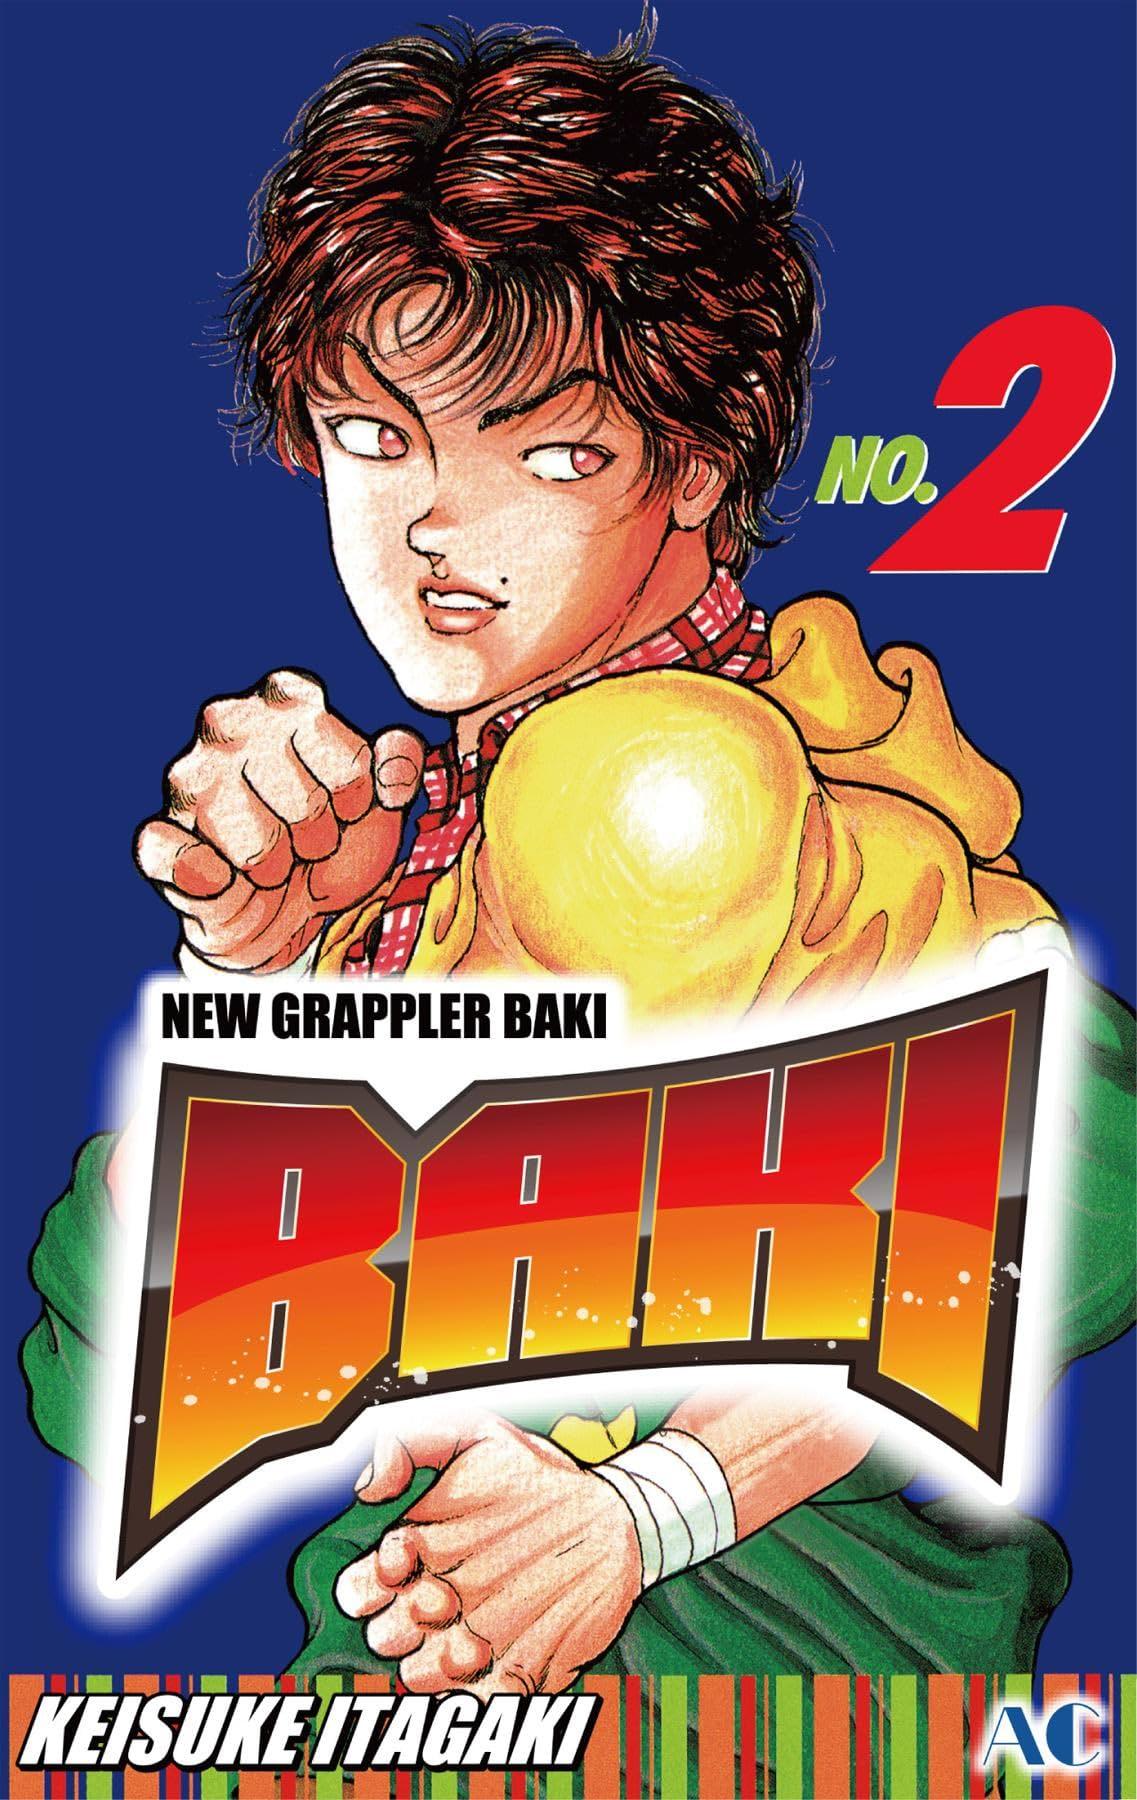 BAKI Vol. 2